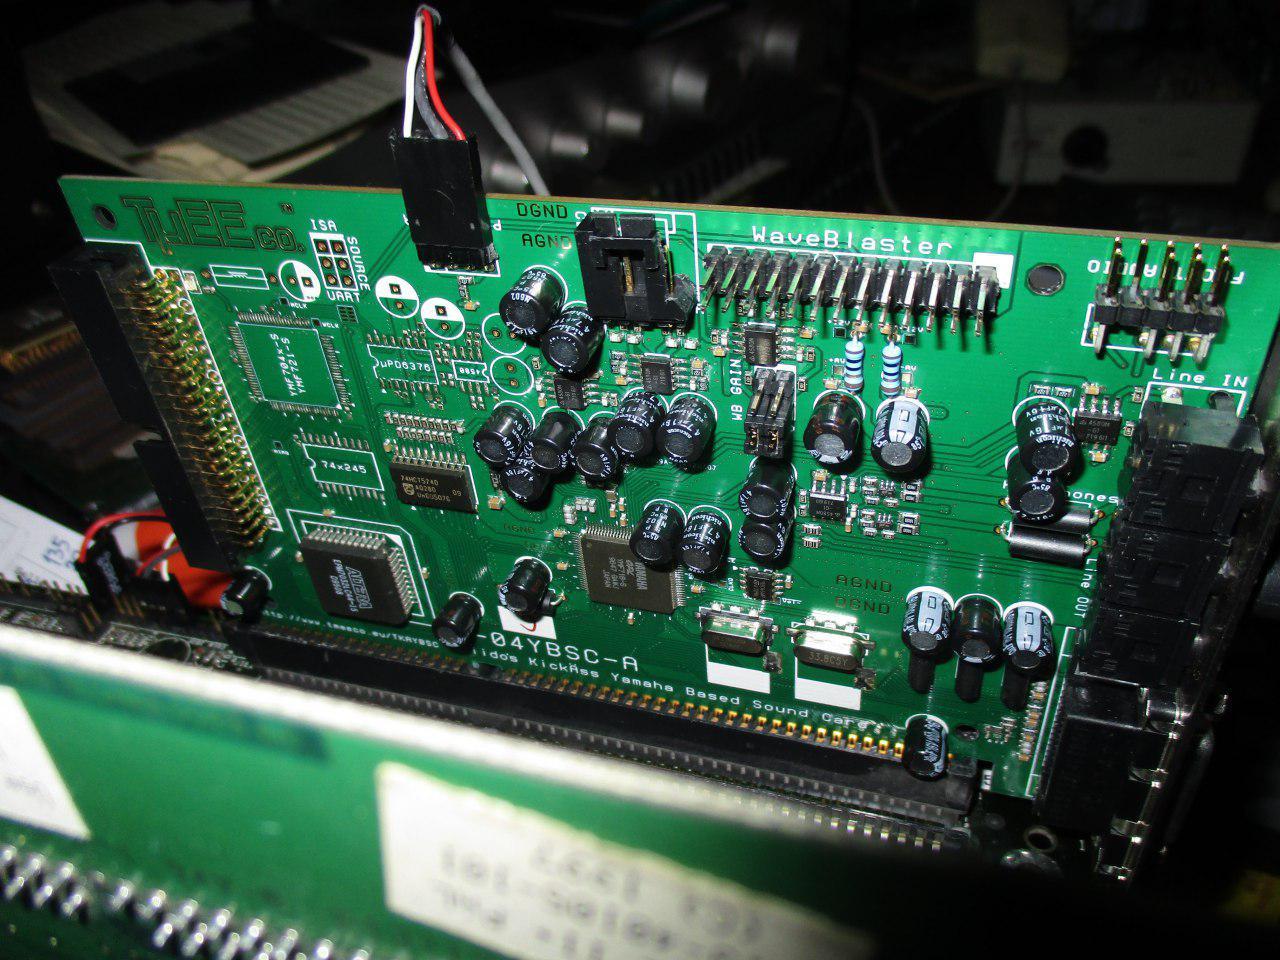 Yamaha opl3-sax wdm drivers for mac megabesttops's diary.